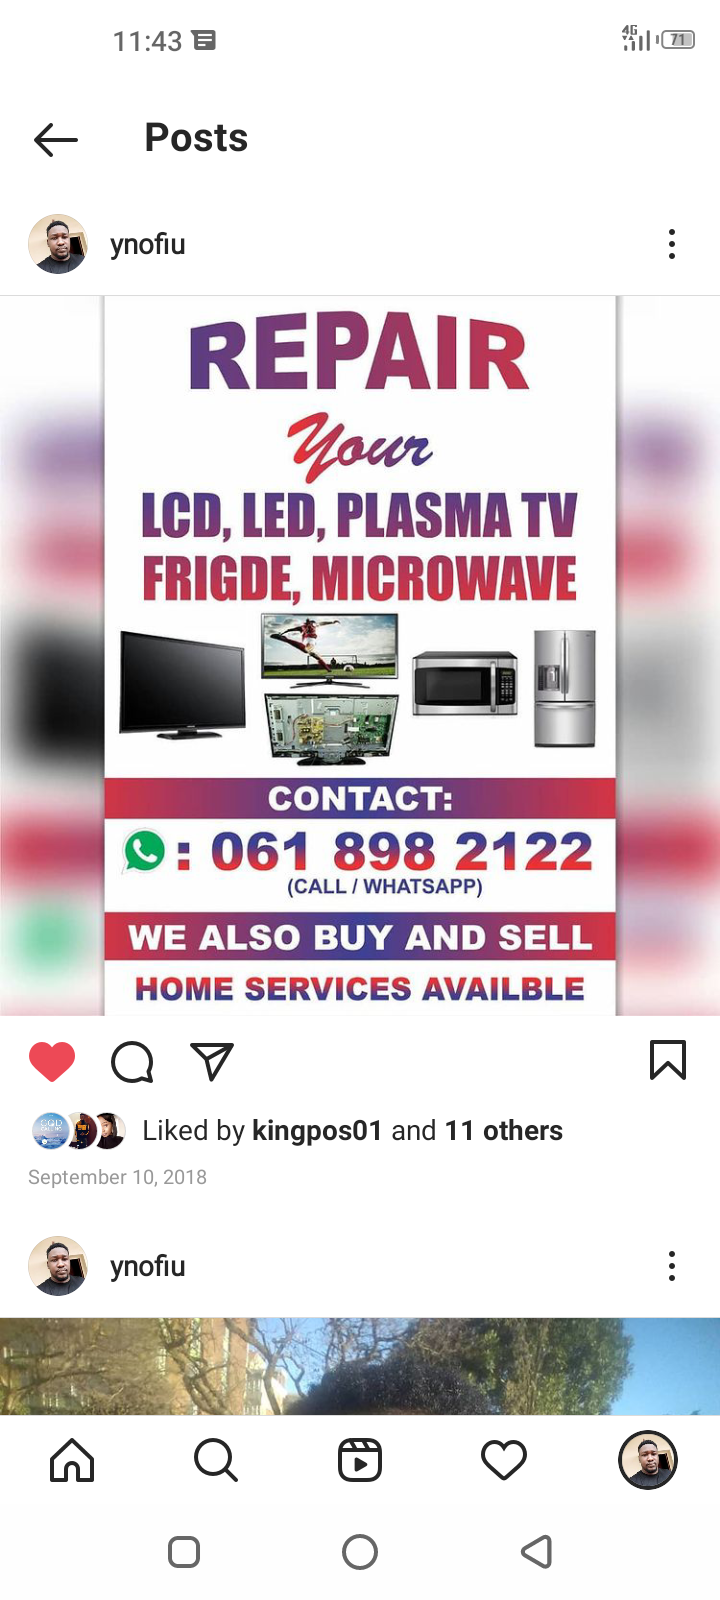 Tvs repairs led lcd plasma tvs we are bank